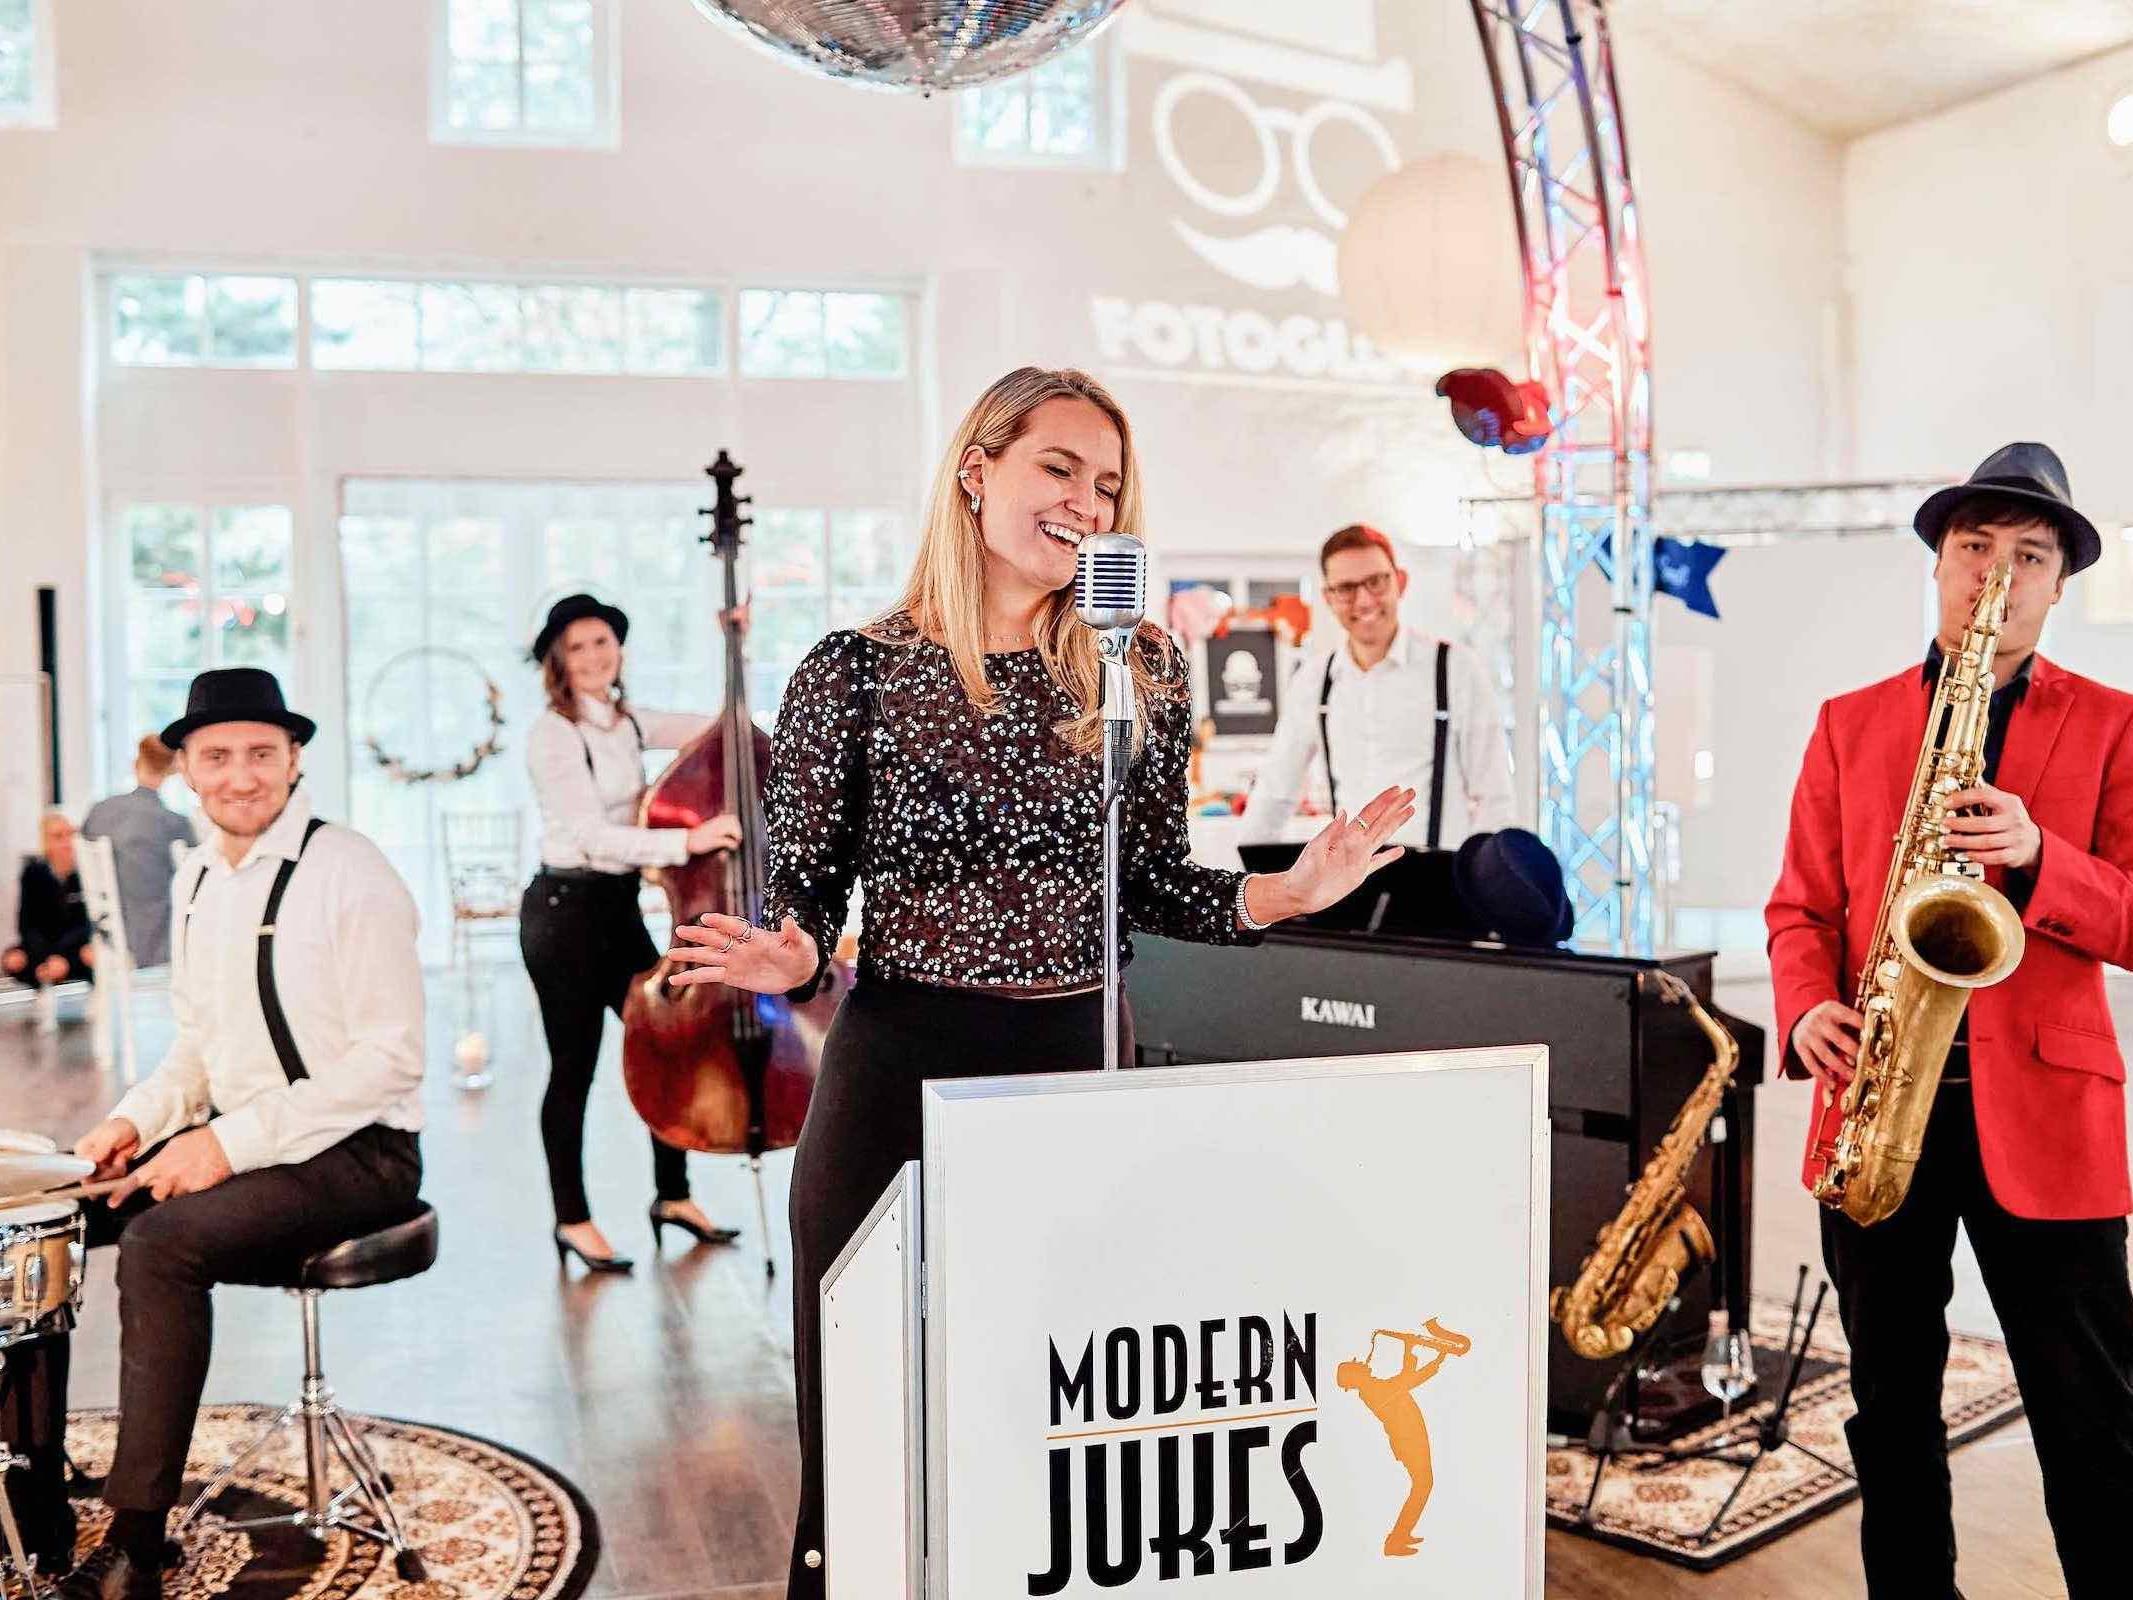 Partyband   Jazzband   Hamburg   Buchen   Band   Empfang   Sektempfang   Popband   Partyband   Sektempfang   Party   Trauung   Dinner   Buchen   Mieten   Hamburgfeiert